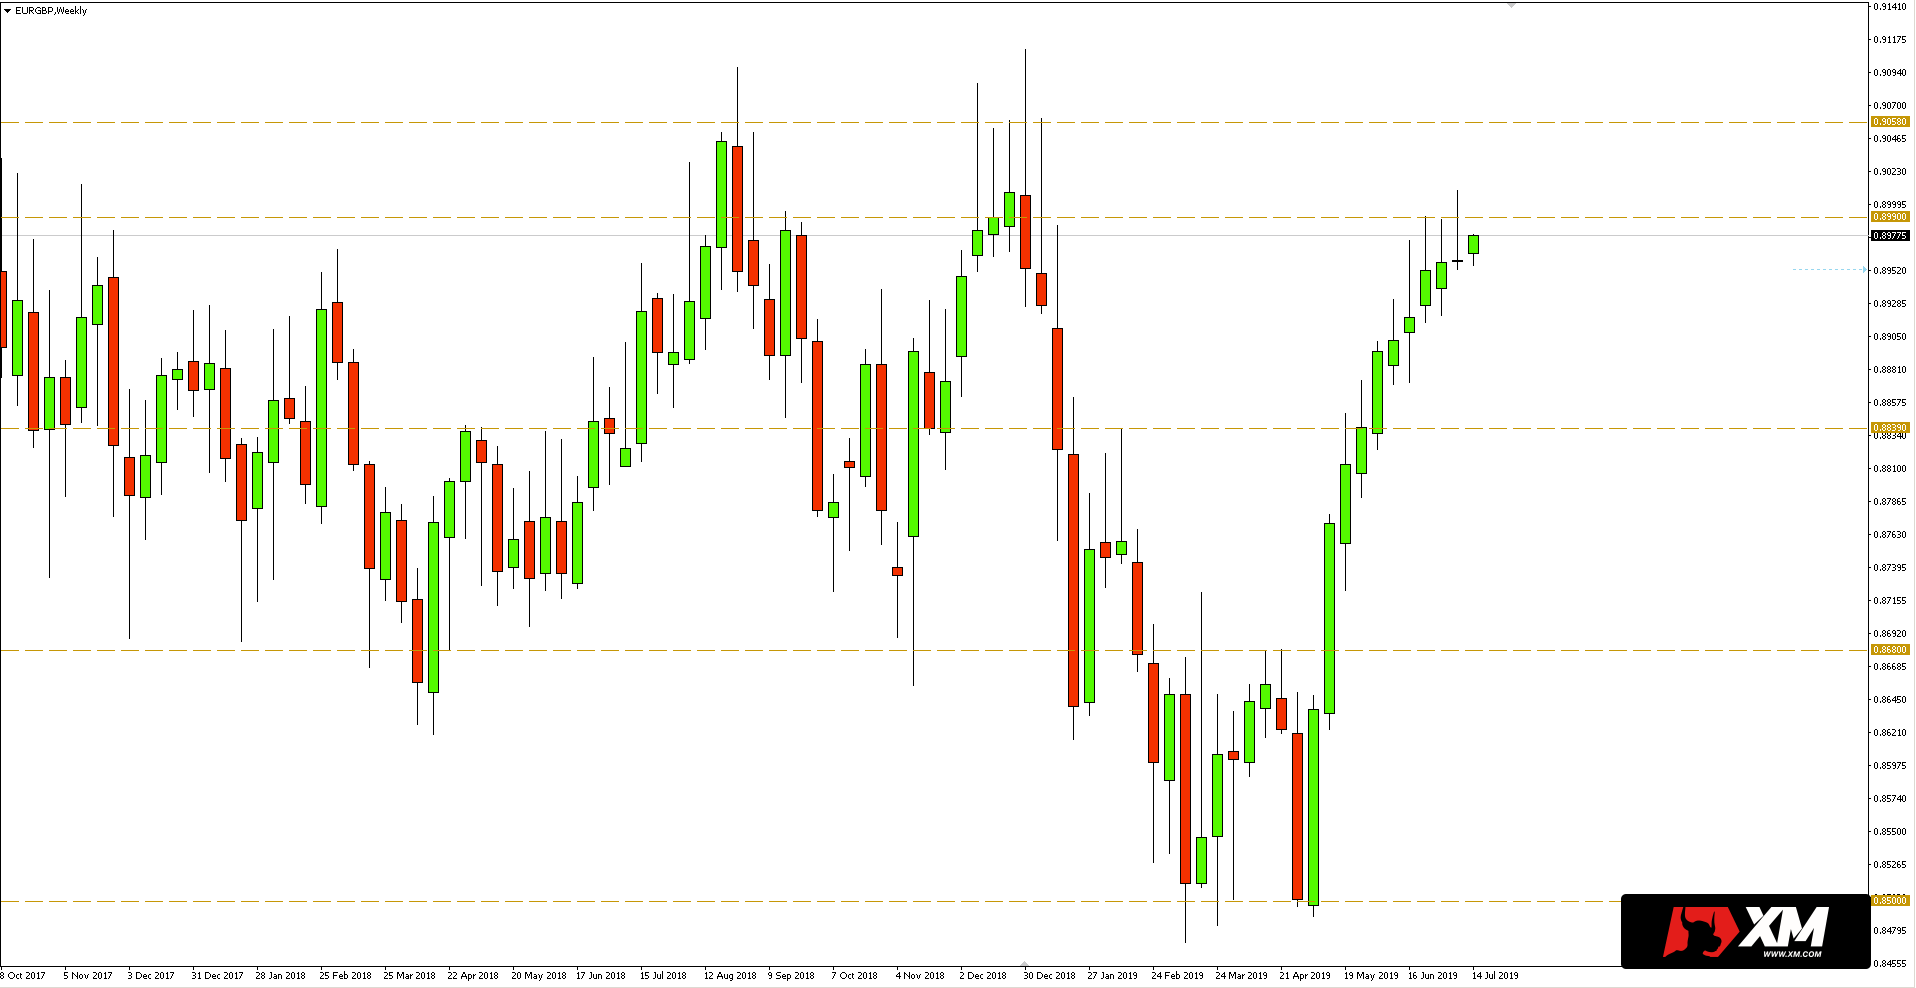 Kurs euro do funta (EUR/GBP) - wykres tygodniowy - 15 lipca 2019